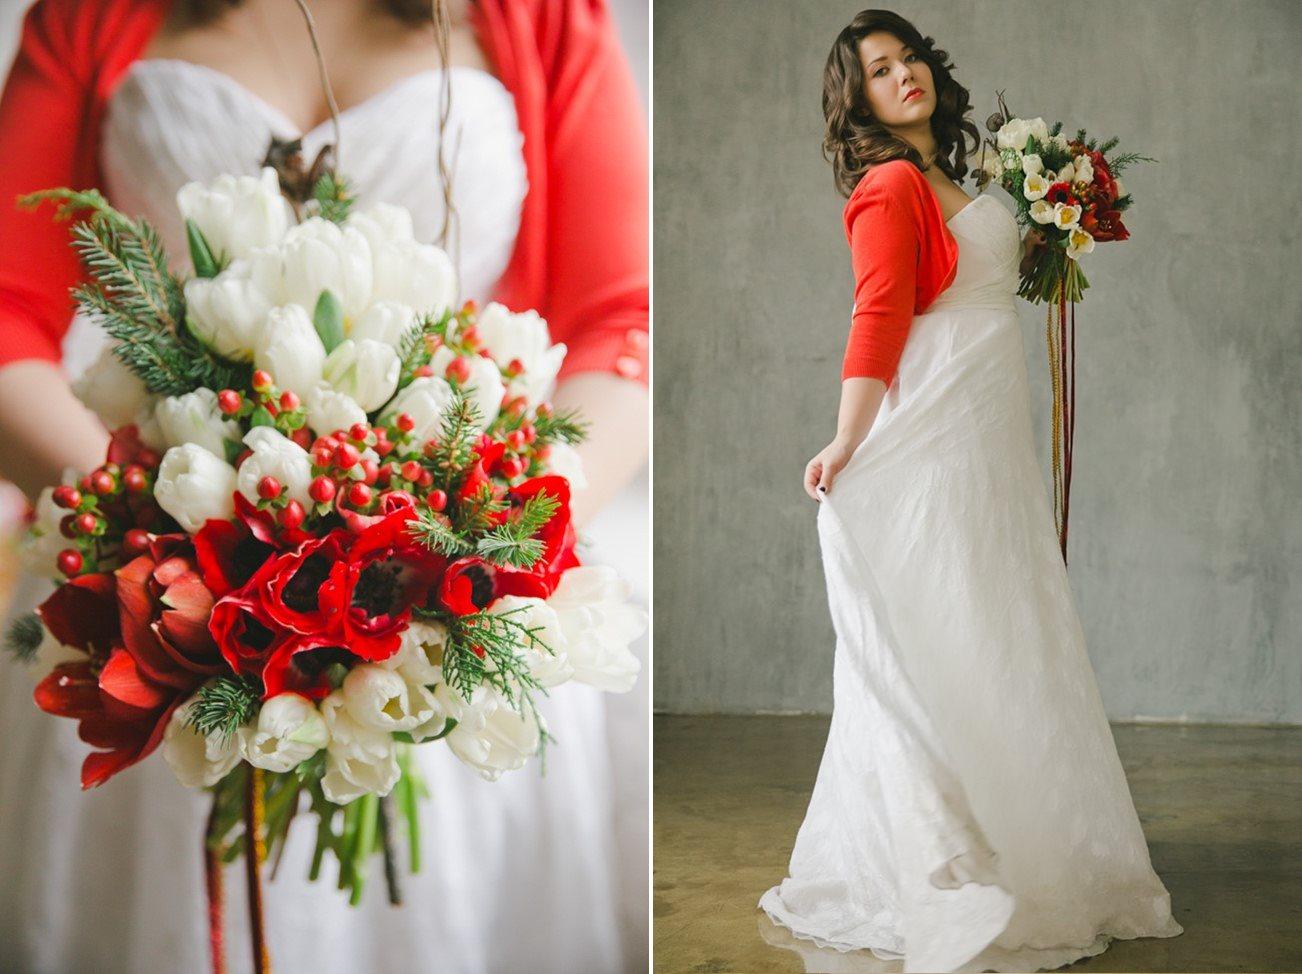 A Christmas Bride.A Fairytale Christmas Wedding Inspiration Shoot Chic